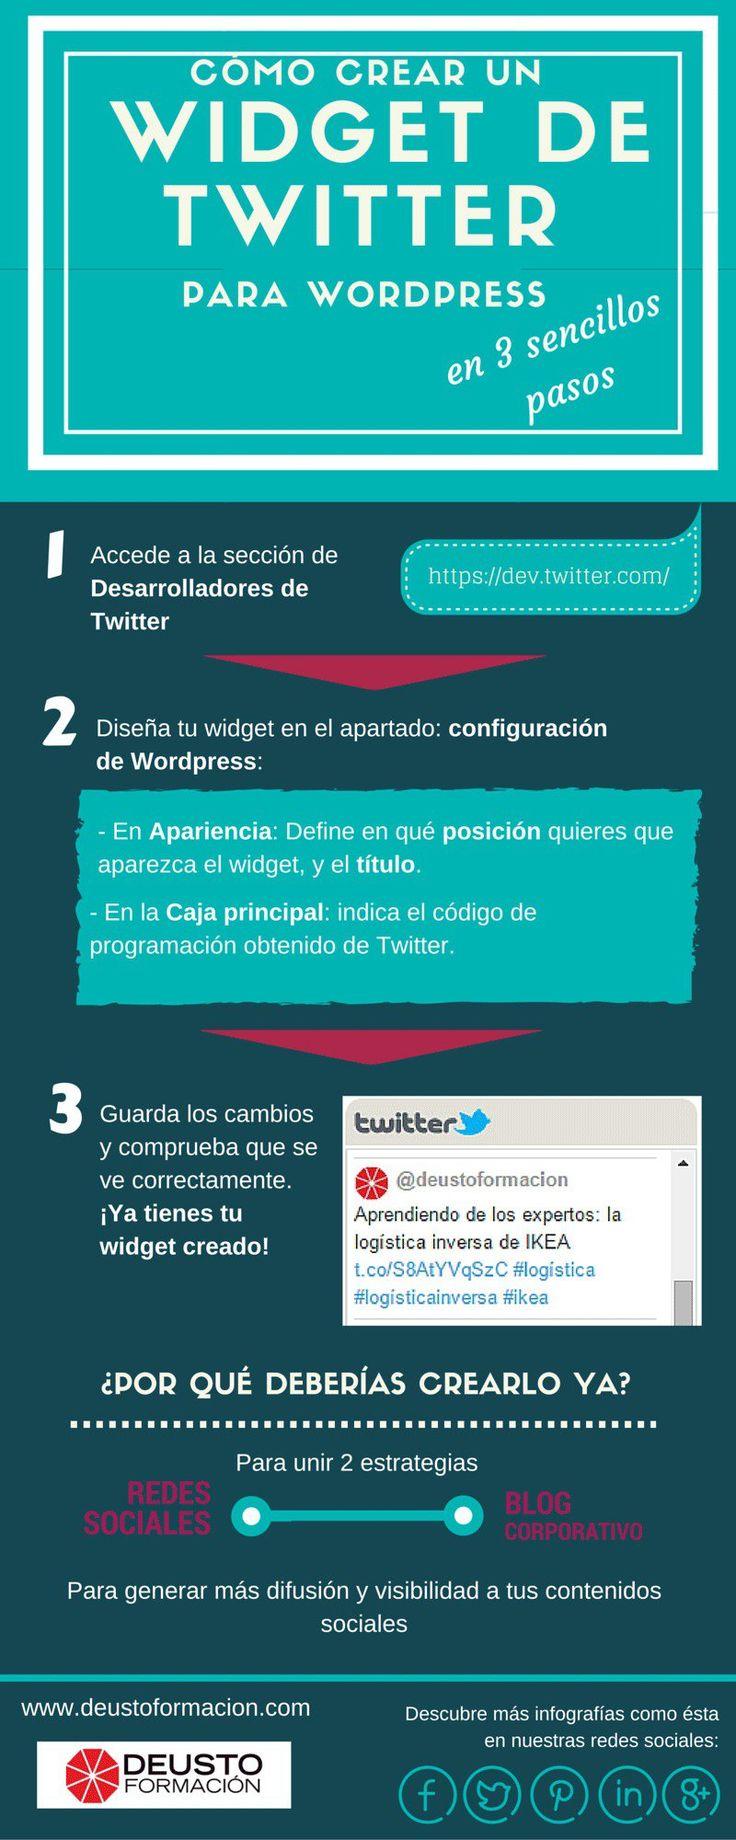 3 pasos para crear un widget de Twitter en WordPress #Infografia #SocialMedia